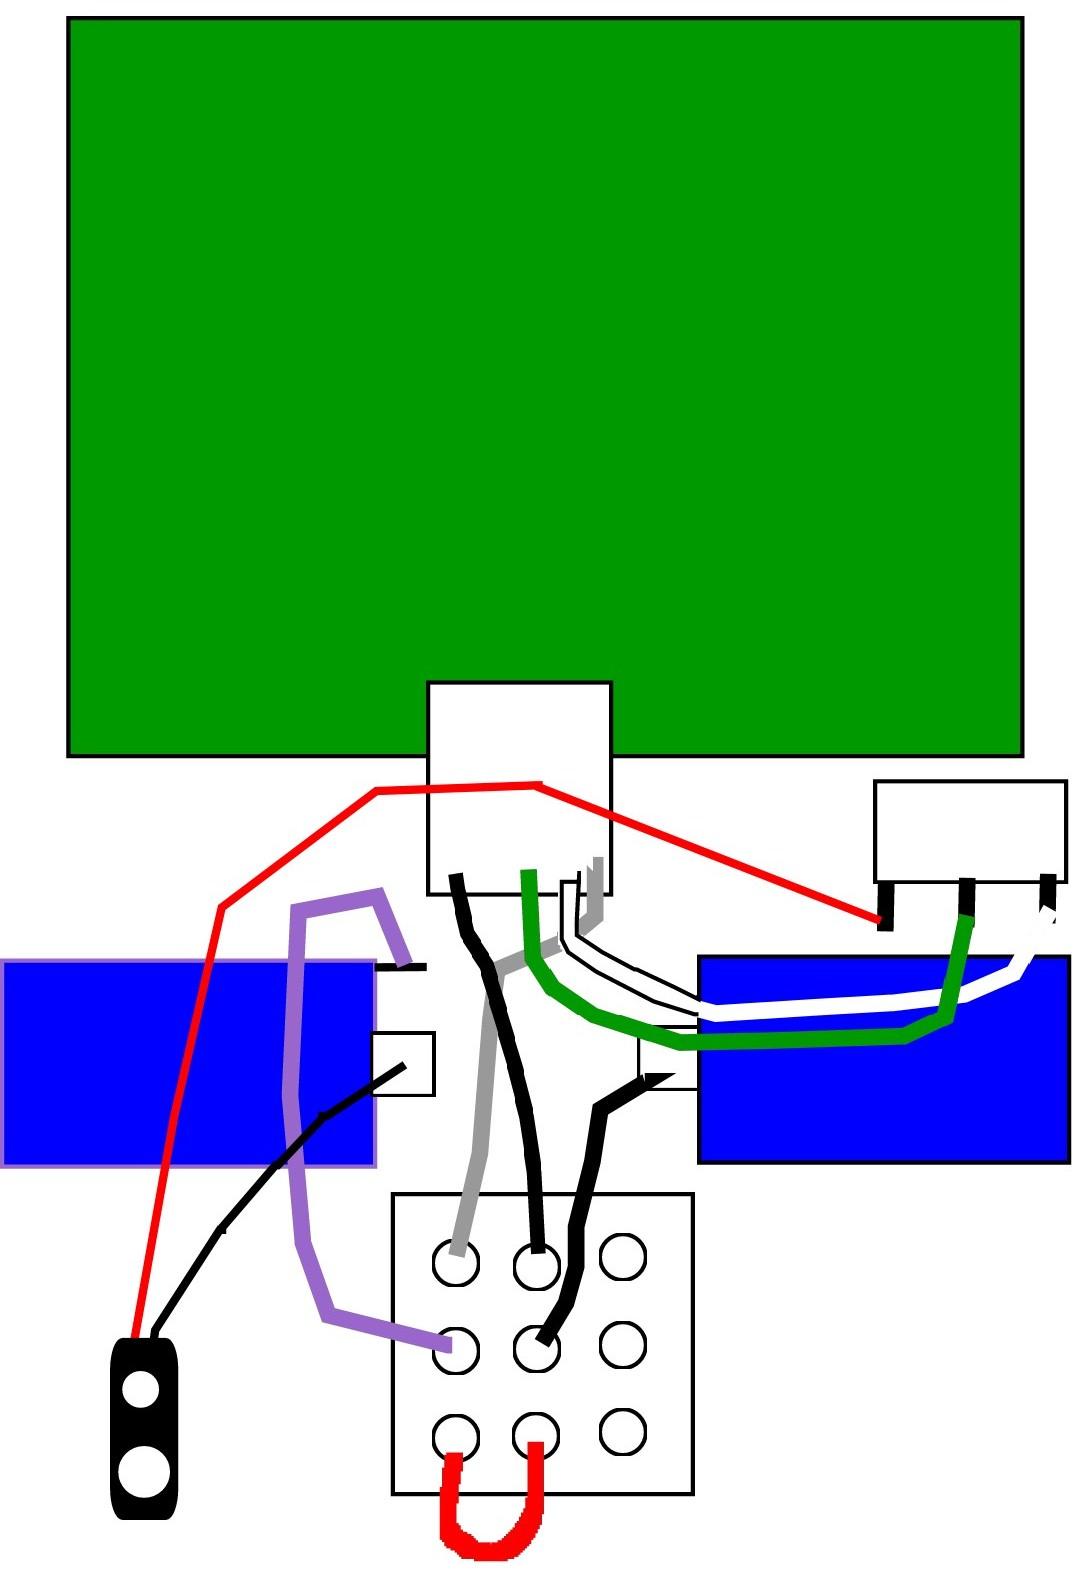 2 sd hoist wiring diagram electric pallet jack diagram yale cpv hoist wiring diagram yale electric chain hoist wiring diagram [ 1073 x 1580 Pixel ]